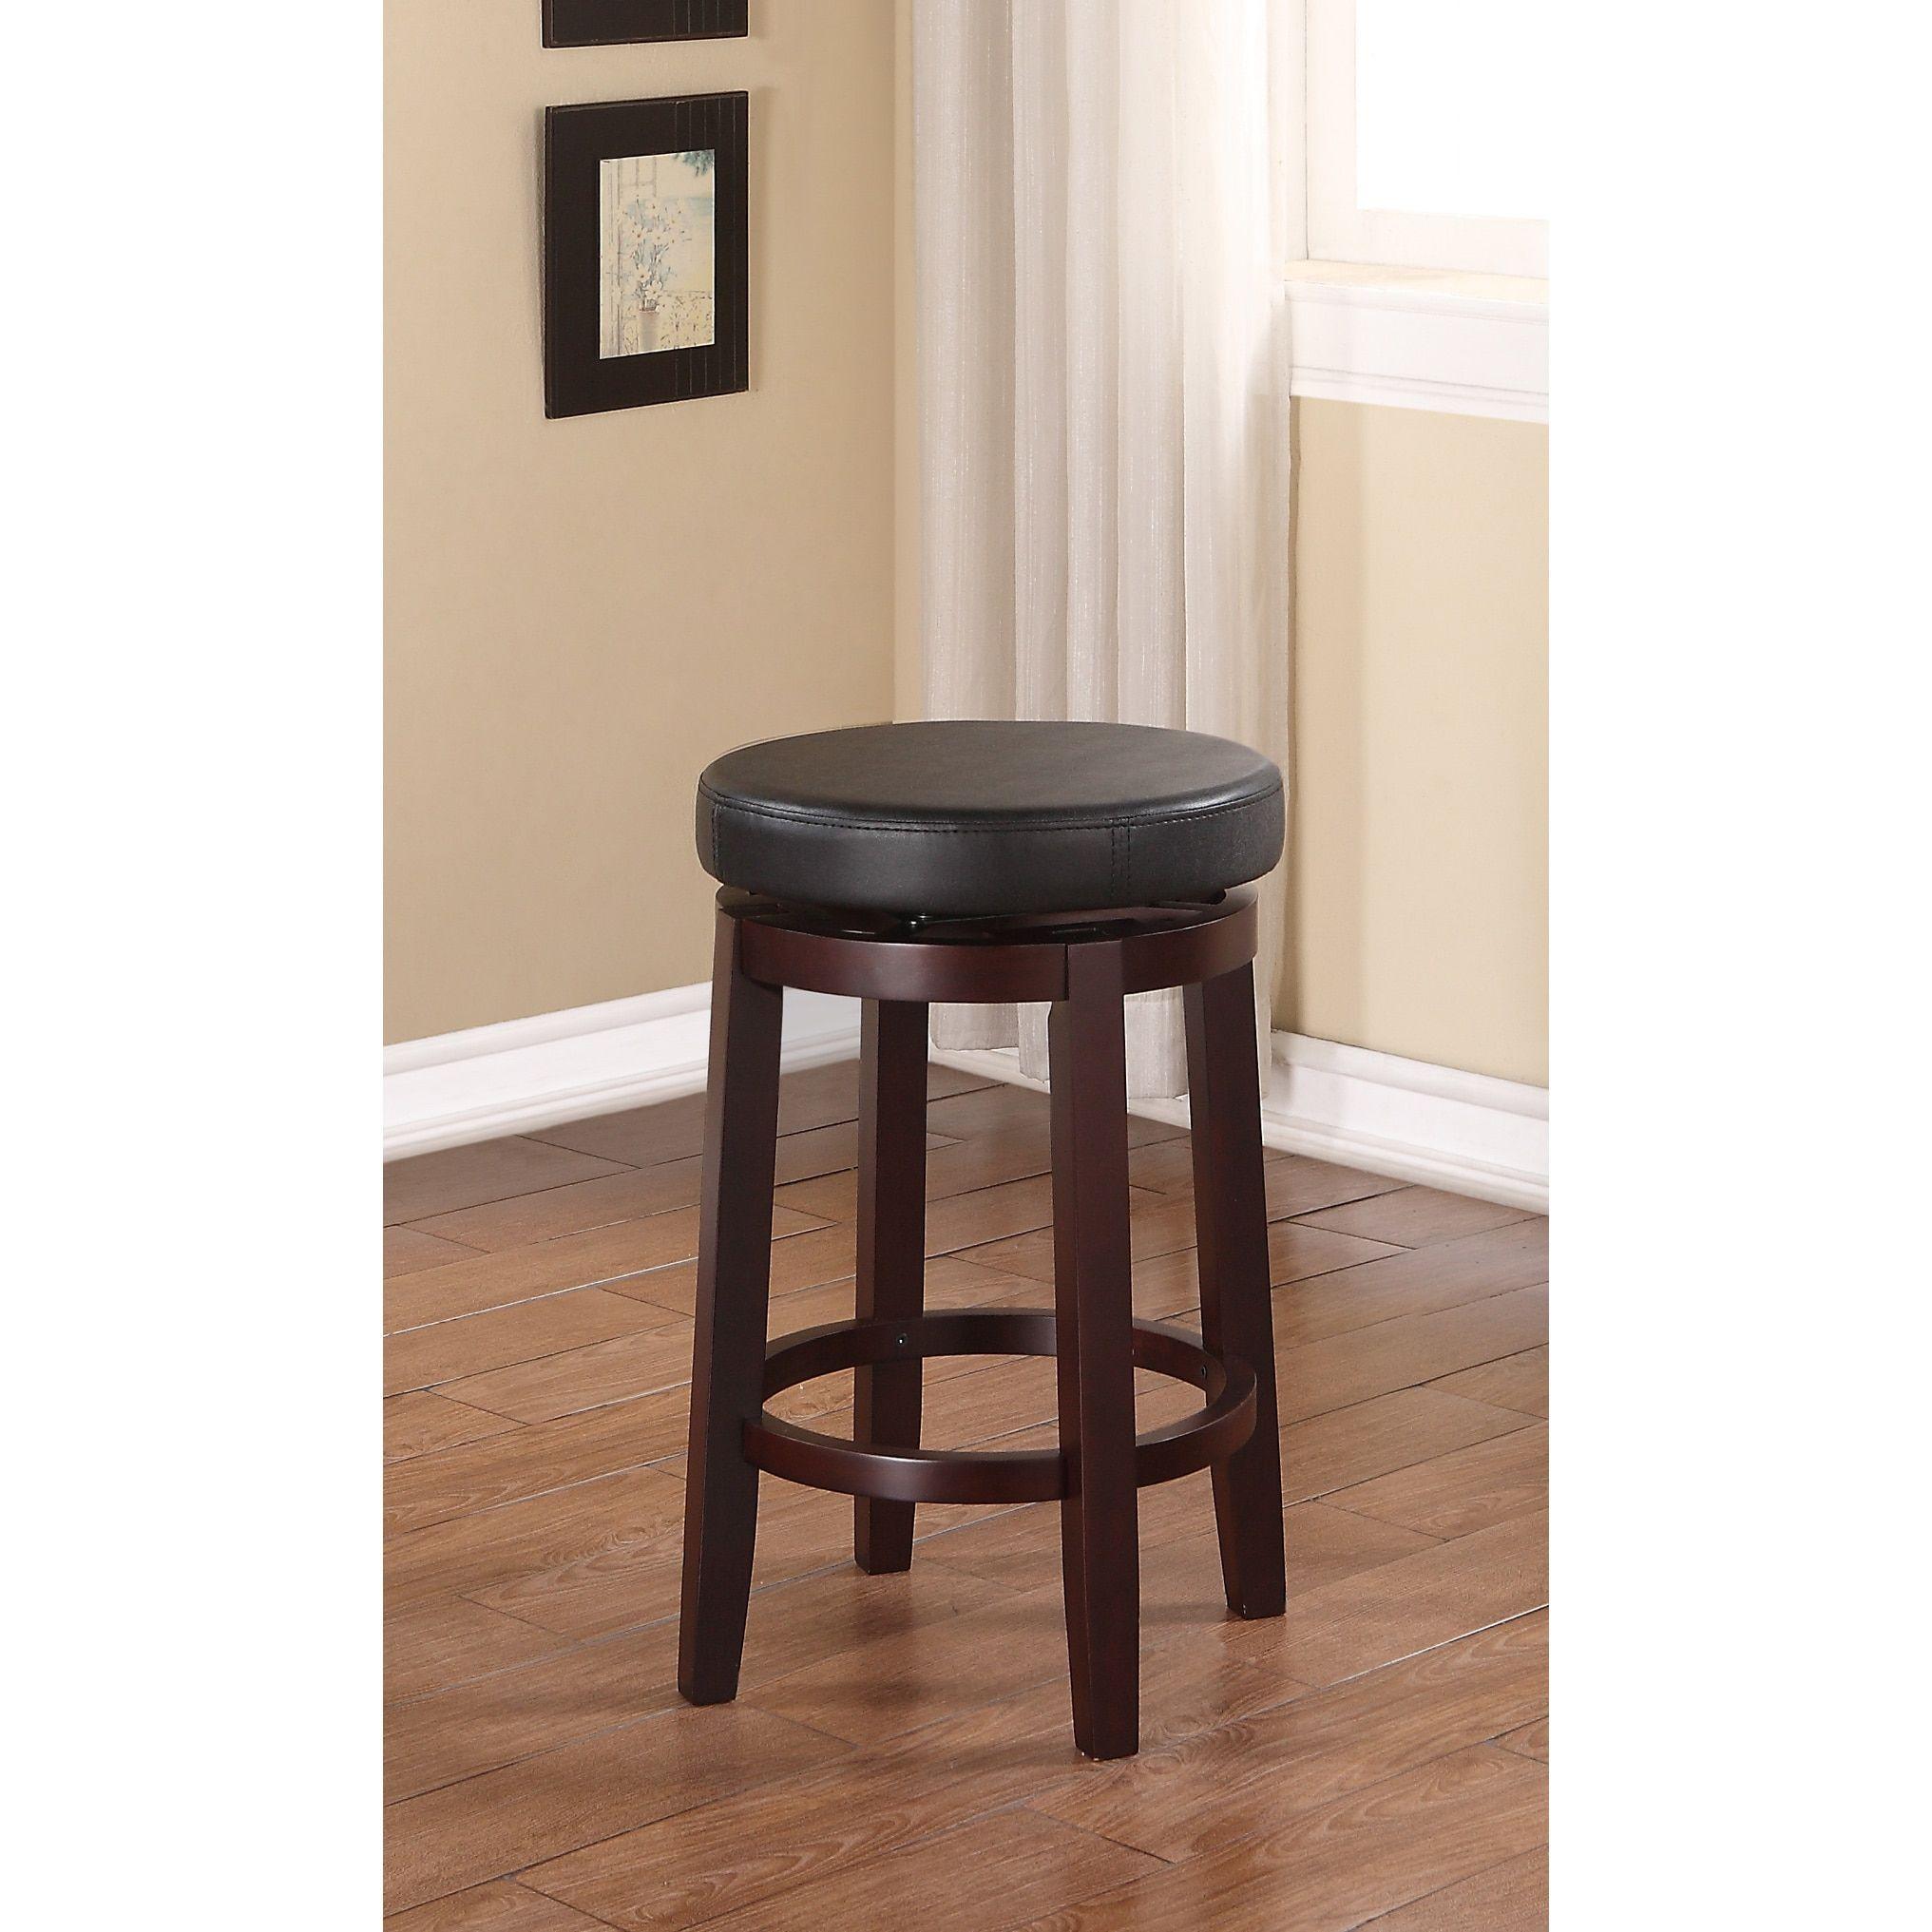 Linon Dorothy Backless Counter Stool Swivel Seat | Counter stools ...